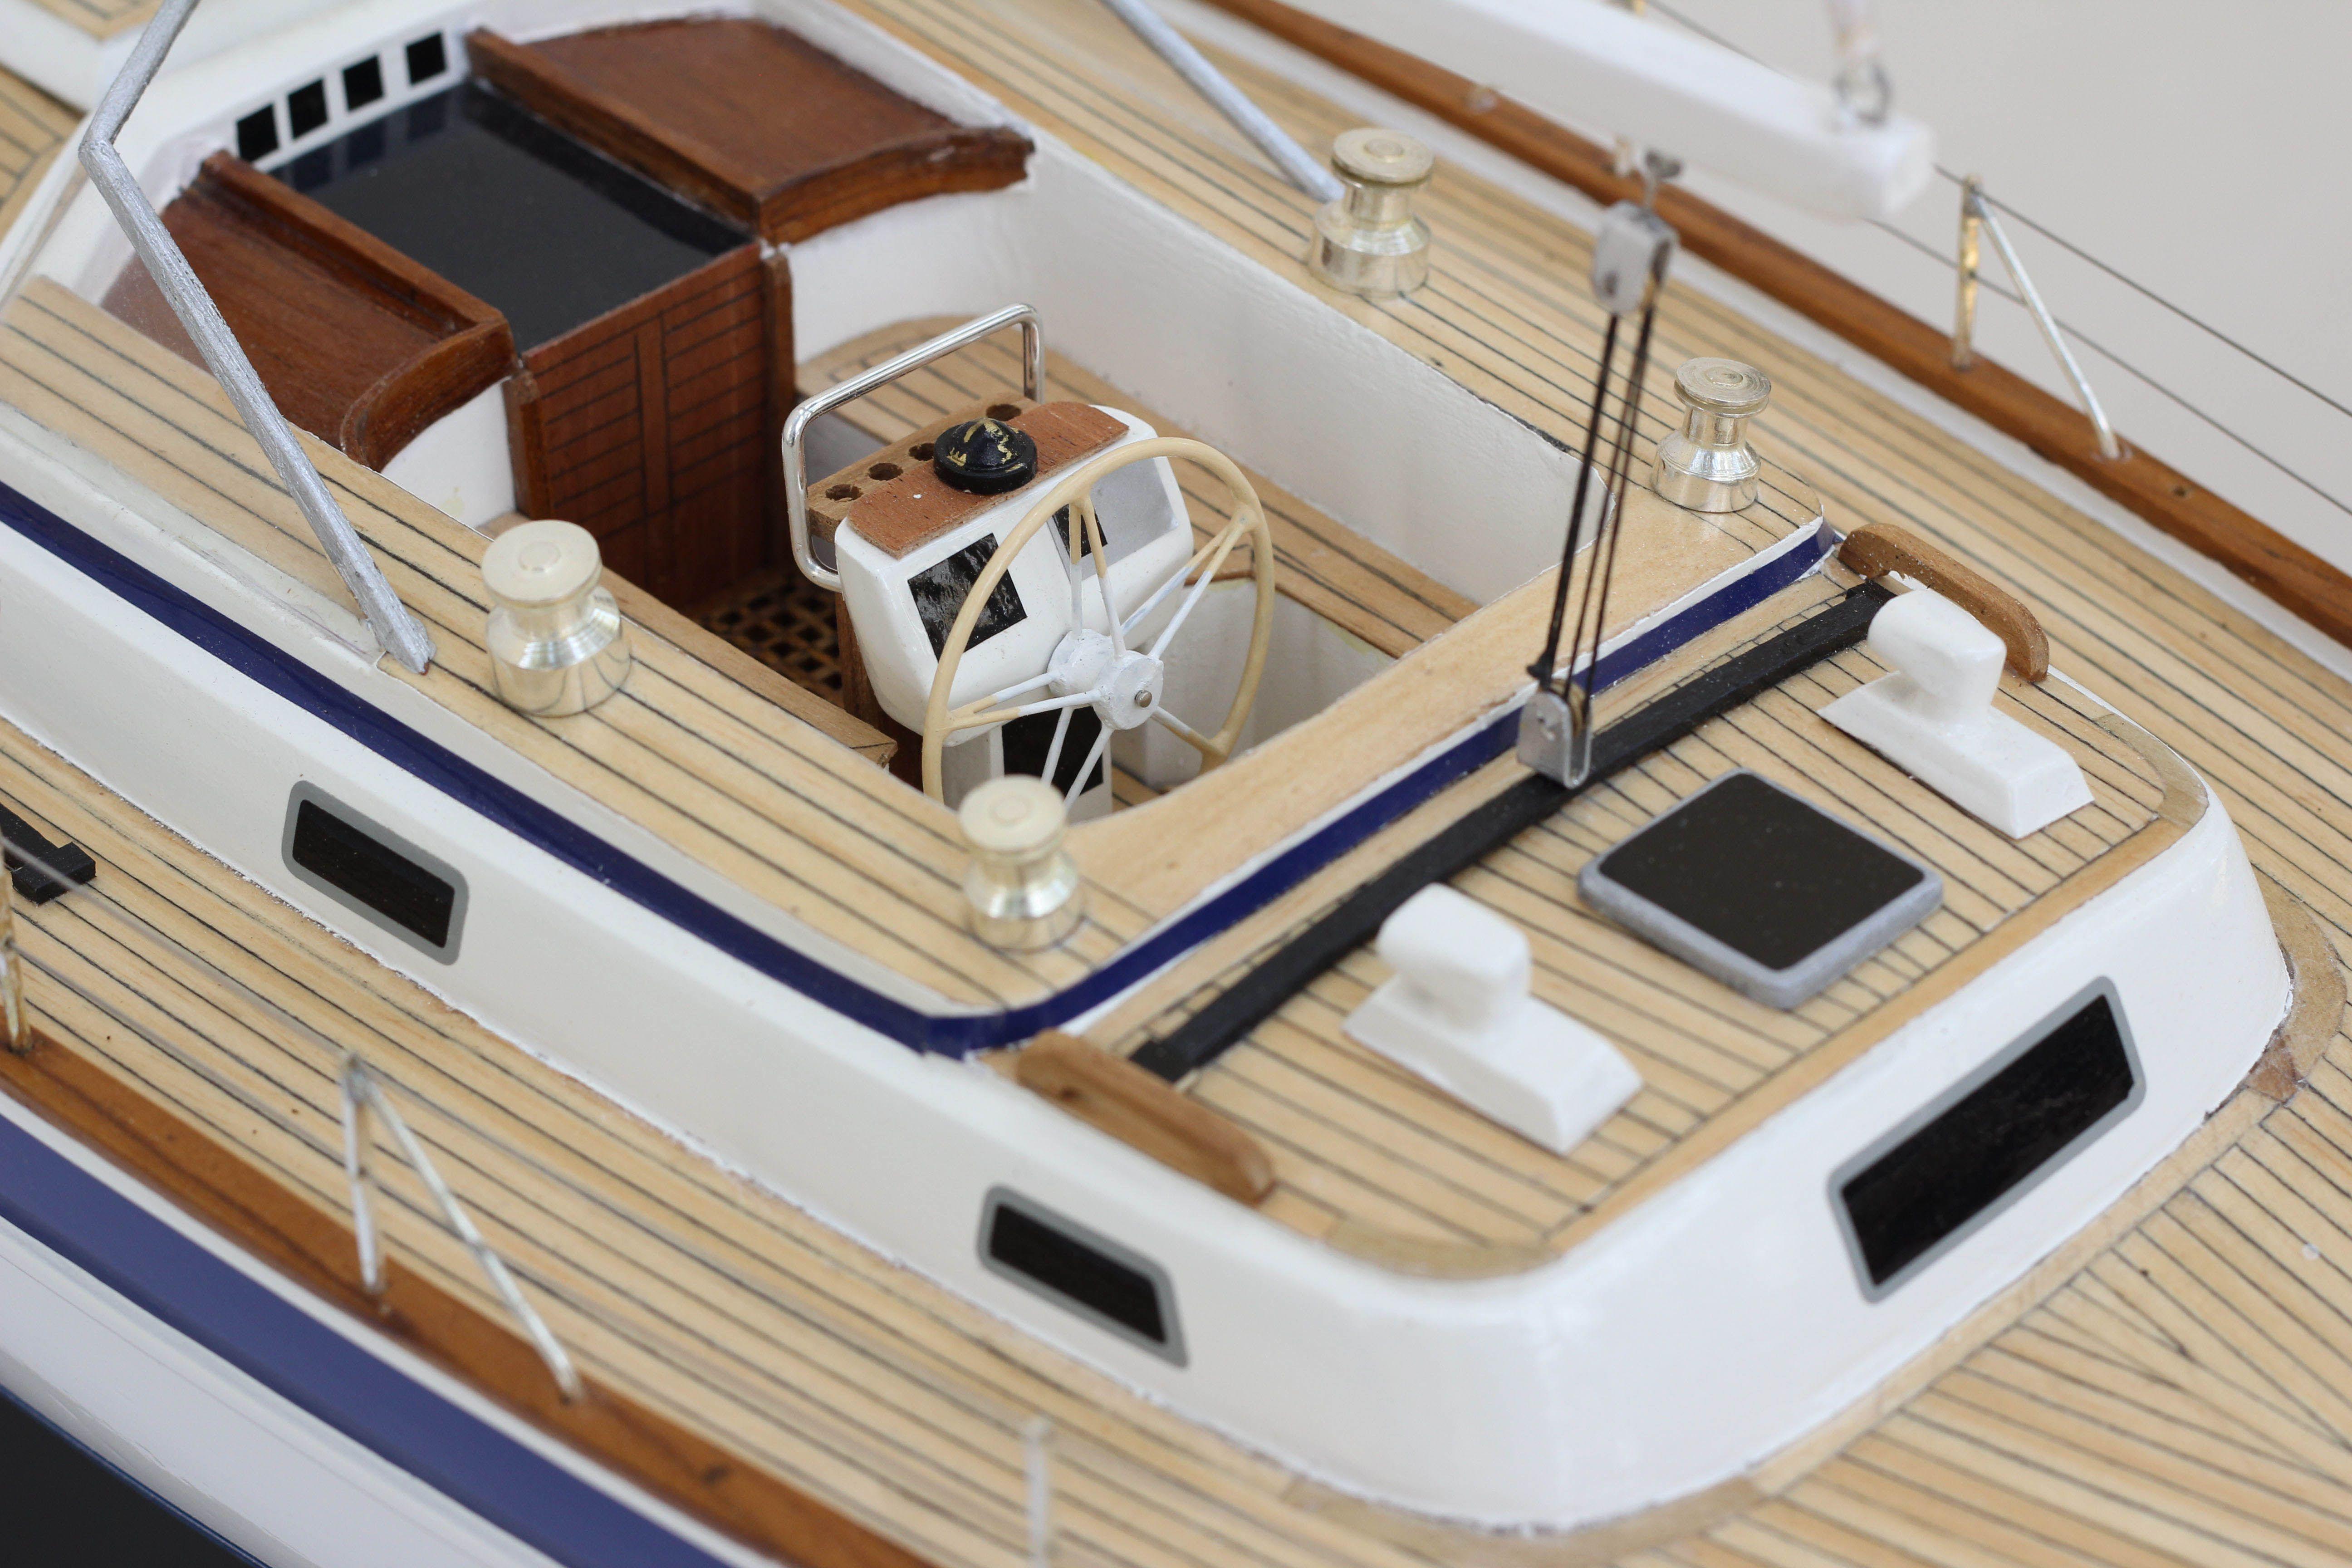 2541-14439-Halberg-Rassy-42-Model-Sailing-Boat-Superior-Range